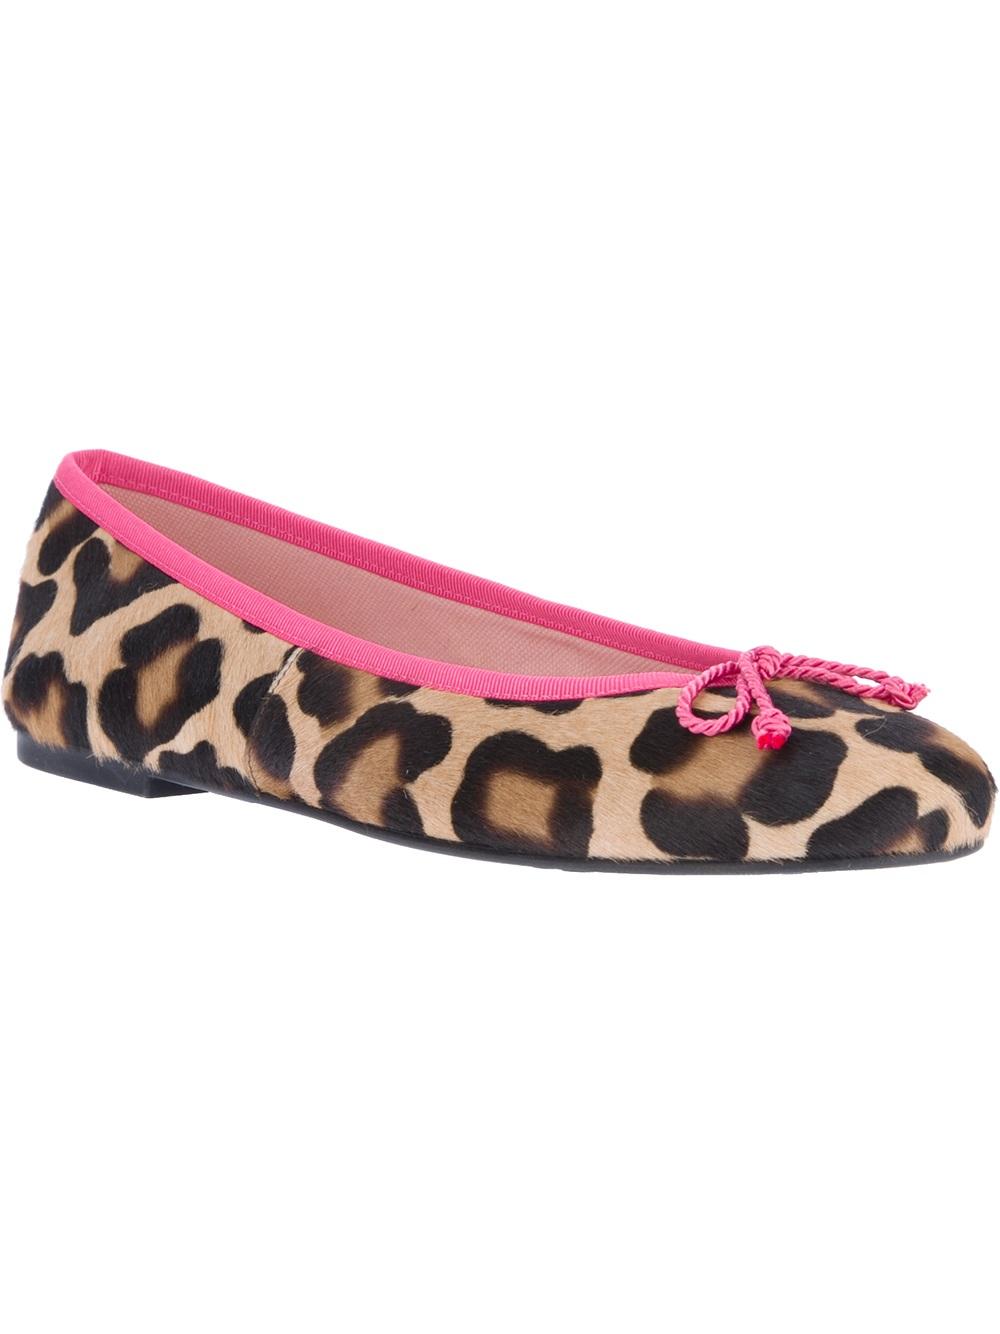 4c318176afa Pretty Ballerinas Leopard Print Ballerina in Pink - Lyst